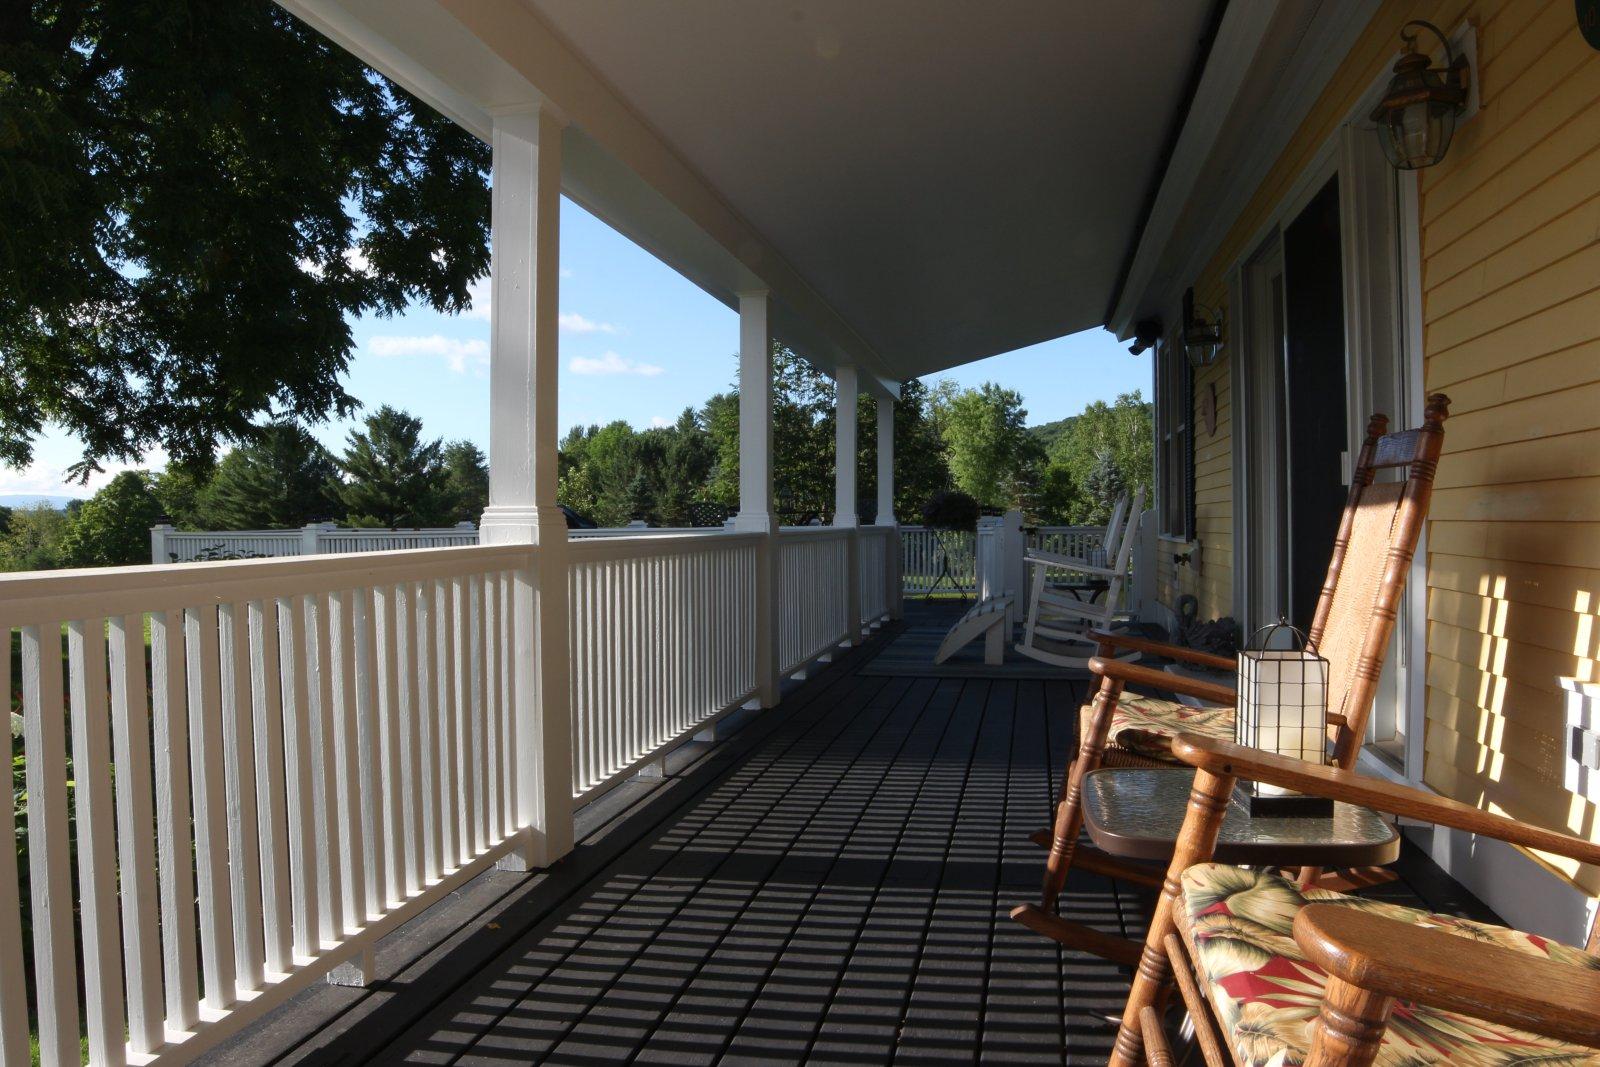 2016 Back Porch (2)